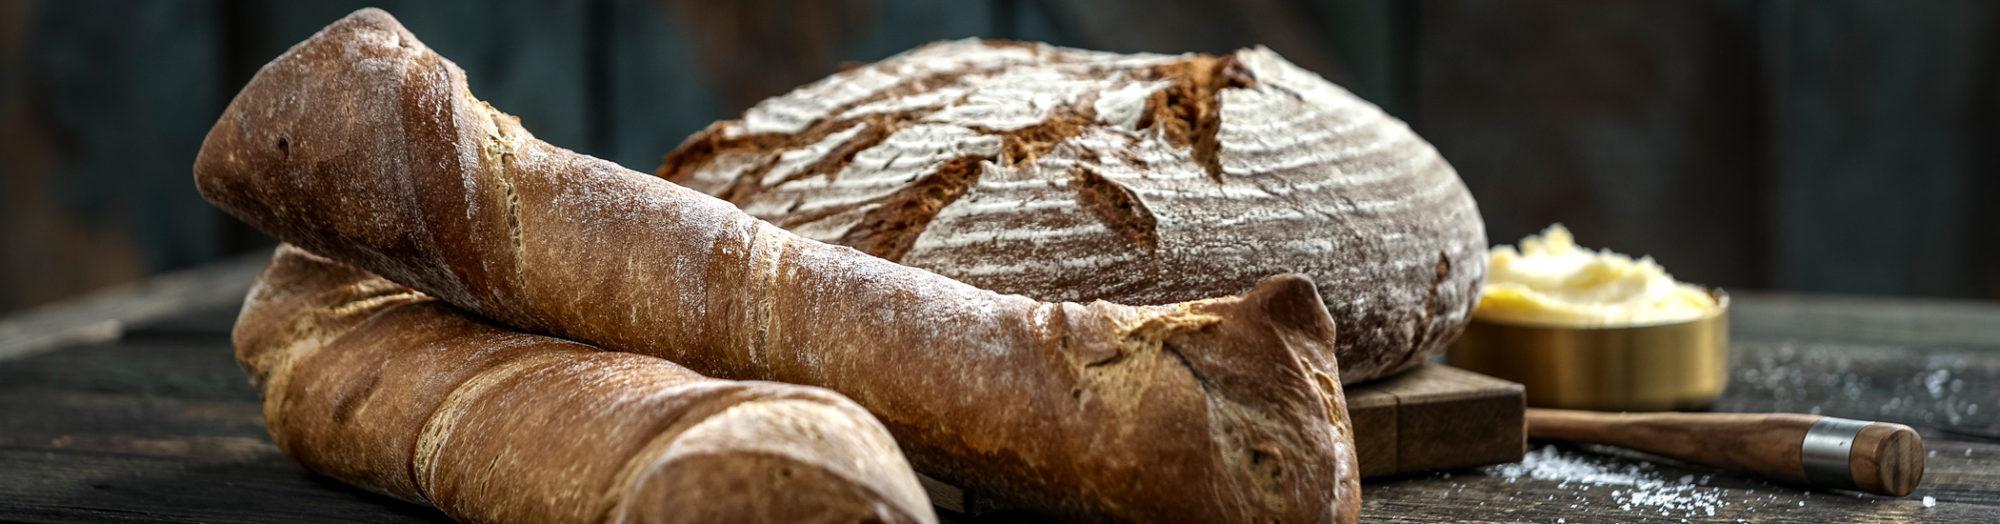 Levante - Bonnevit Feinbäckerei